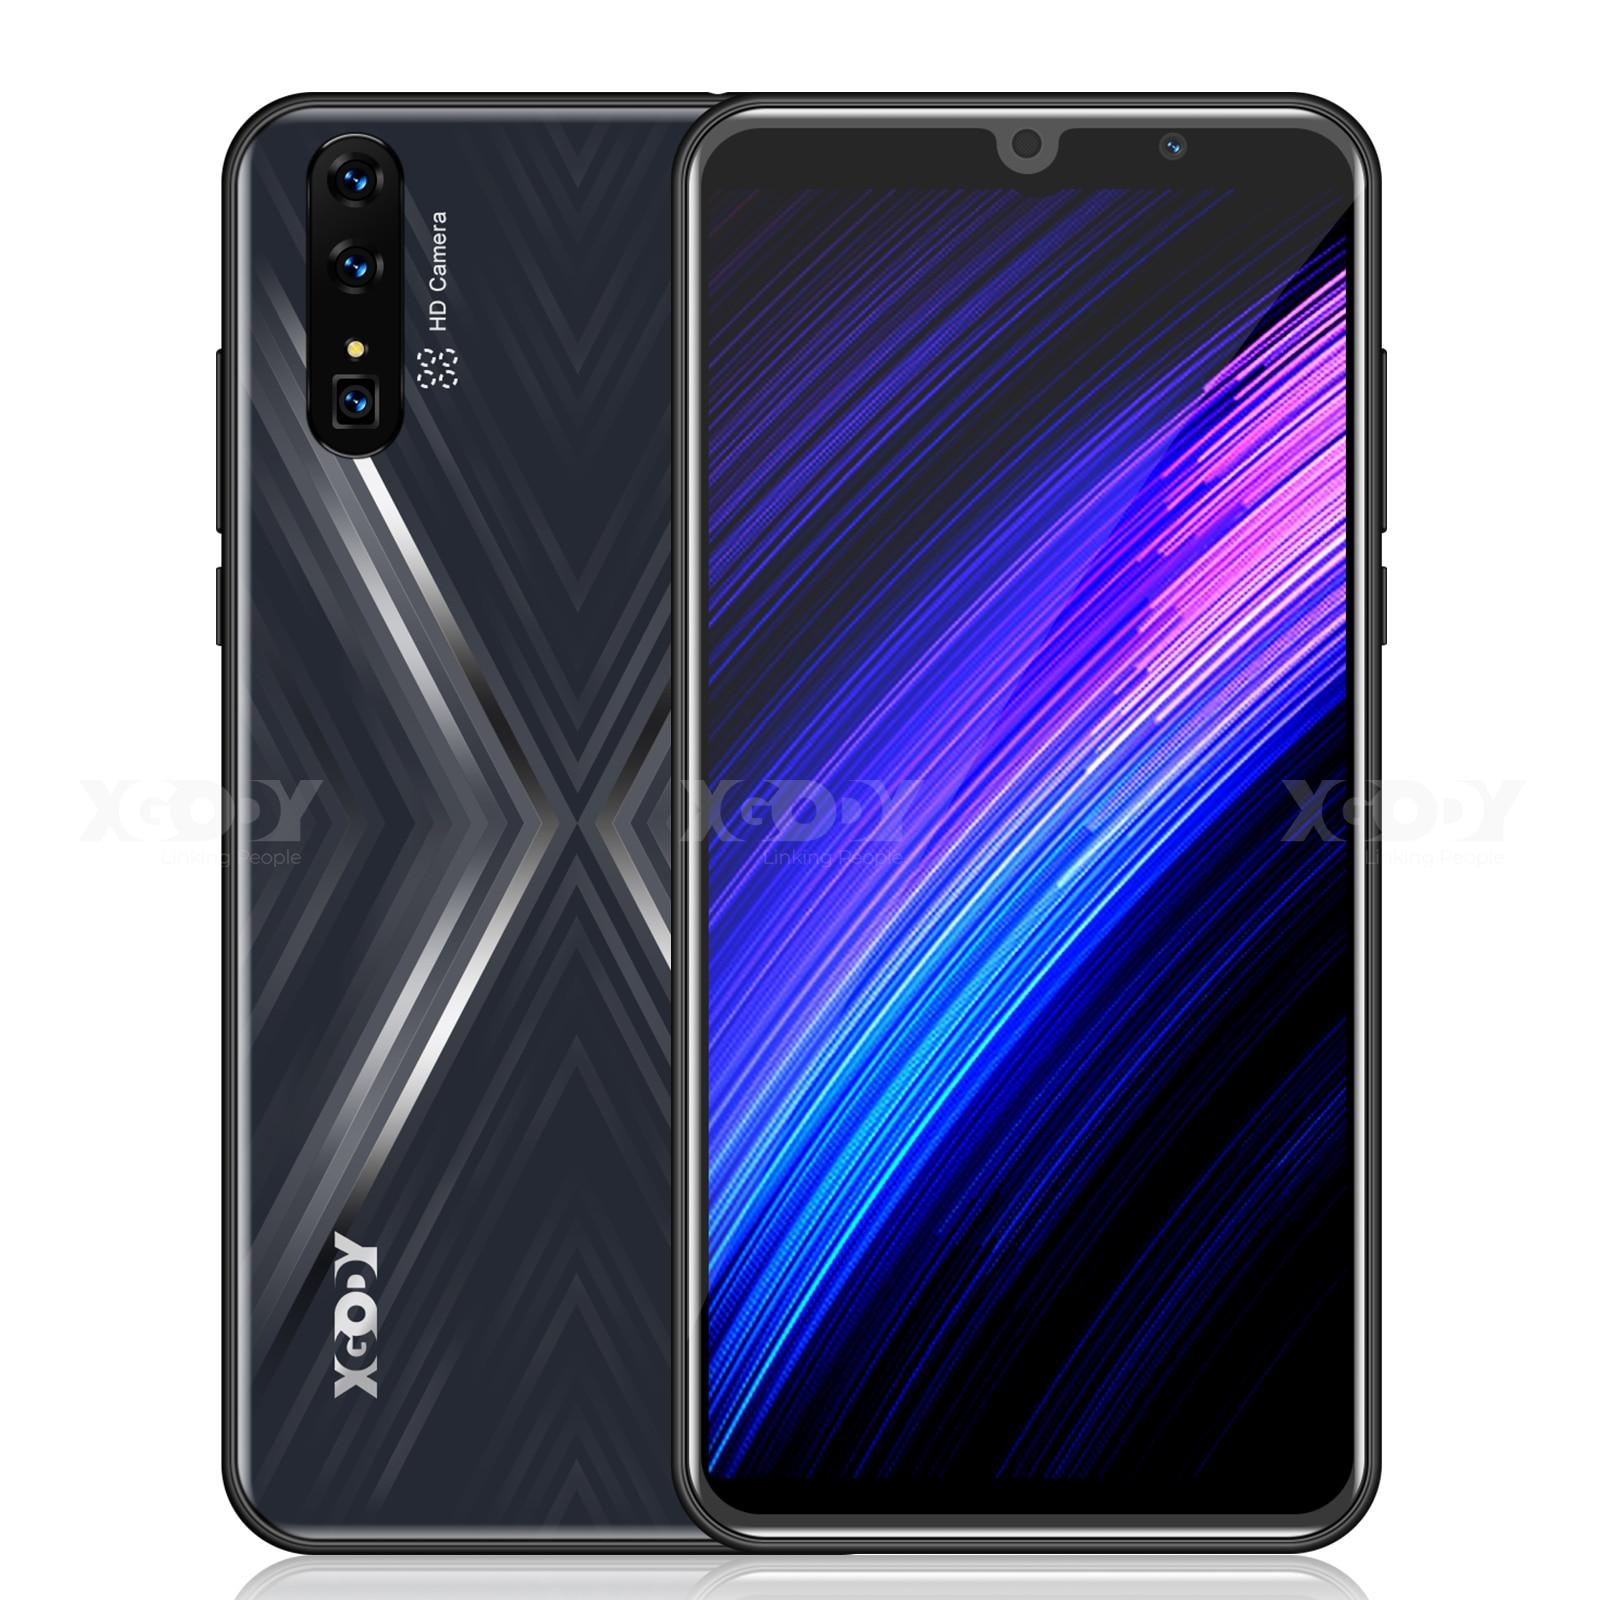 "XGODY mateX 3G Smartphone 6 ""Android 9,0 18:9 qHD MTK6580 2GB de RAM 16GB ROM 2800mAh Dual SIM 5.0MP Cámara GPS WiFi teléfono móvil"